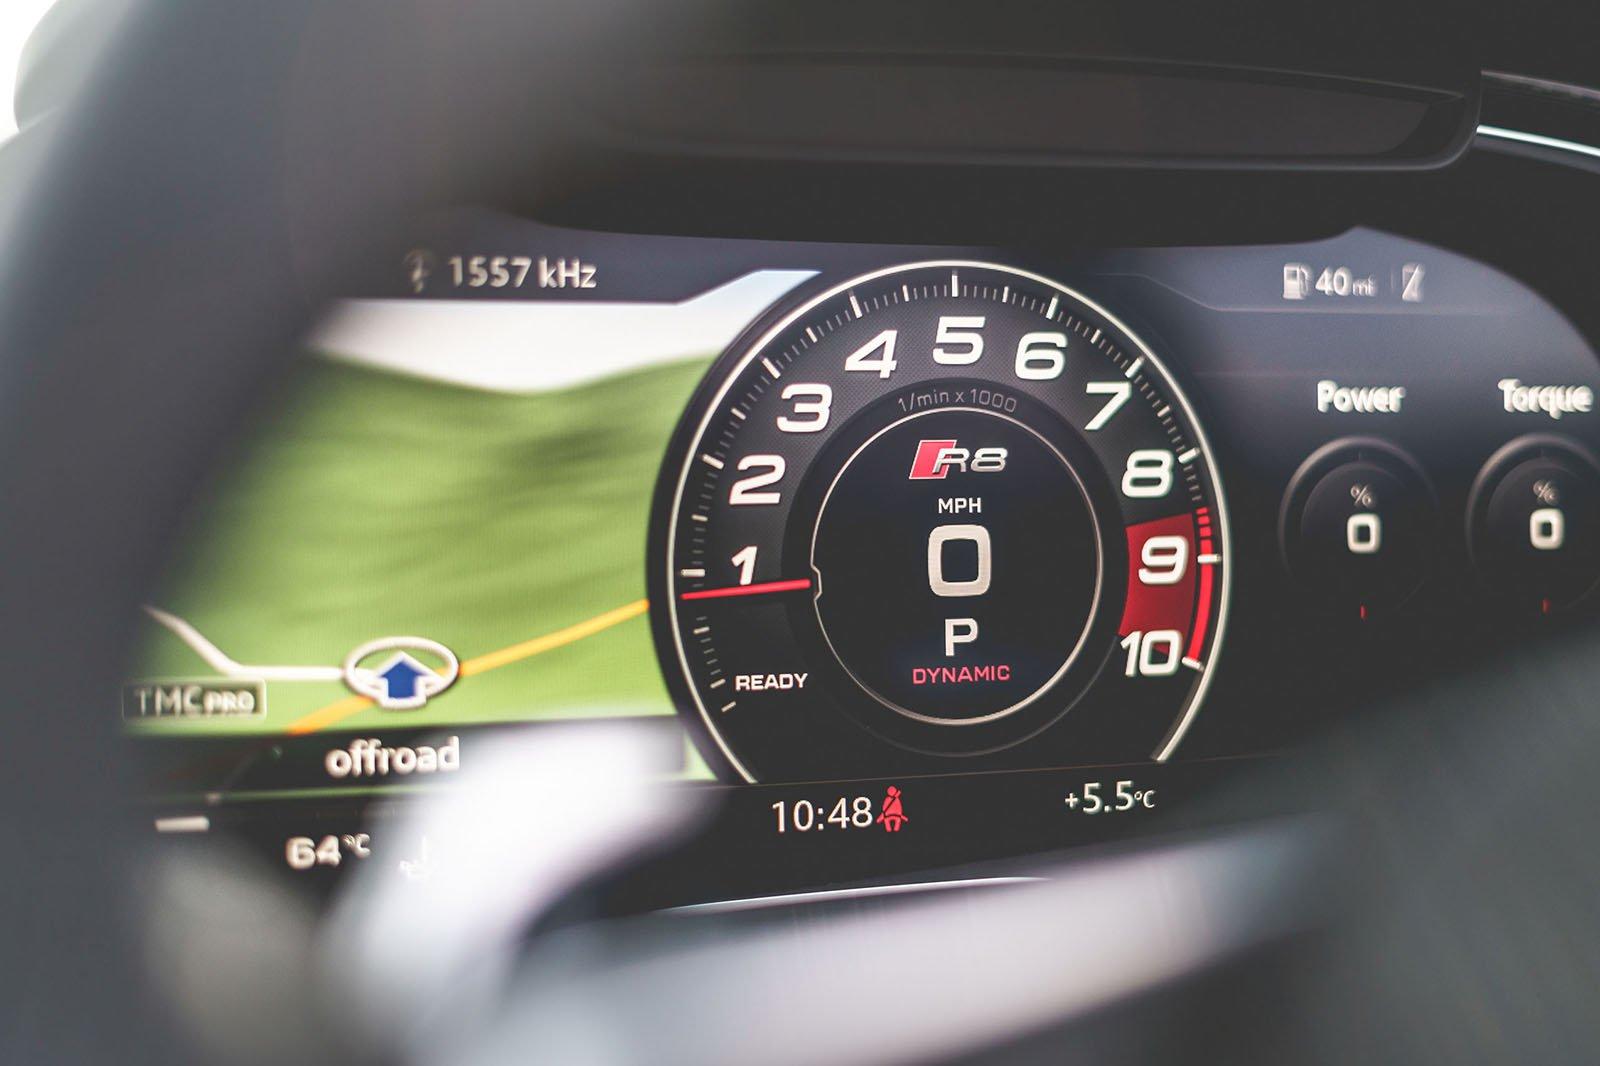 Audi R8 2019 RHD dashboard infotainment